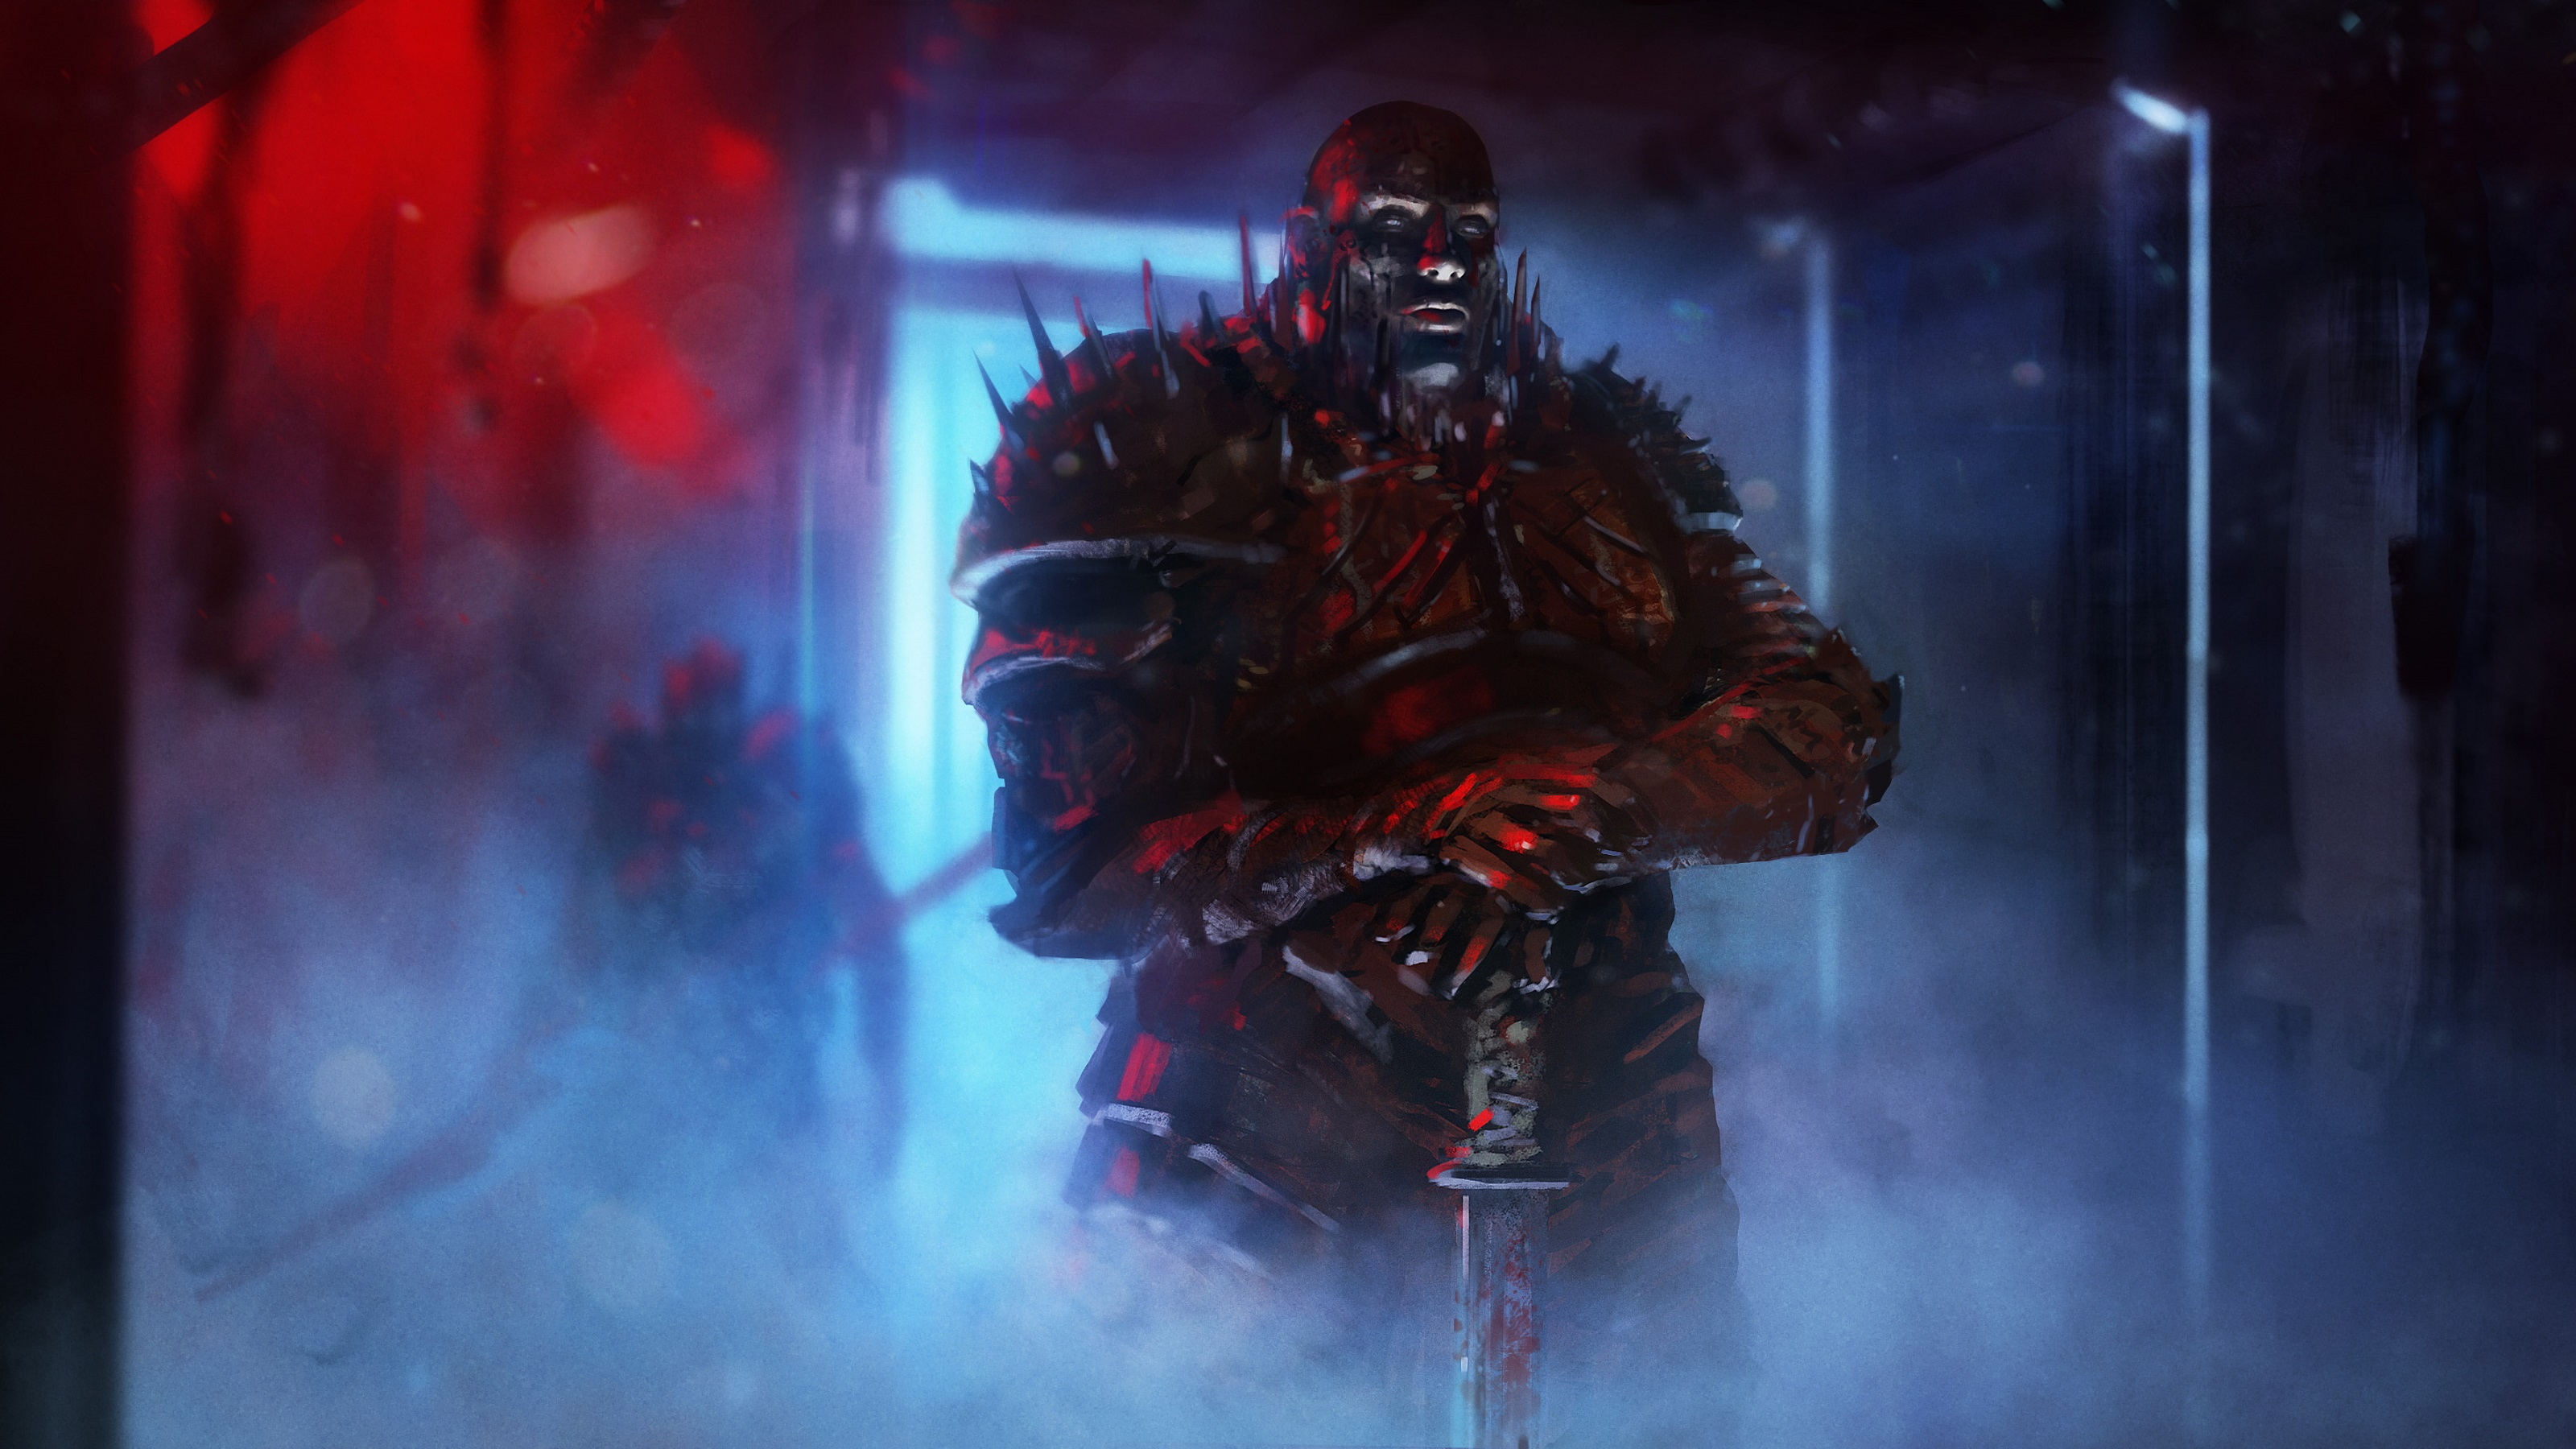 Warrior Hd Wallpaper Background Image 3200x1800 Id 405544